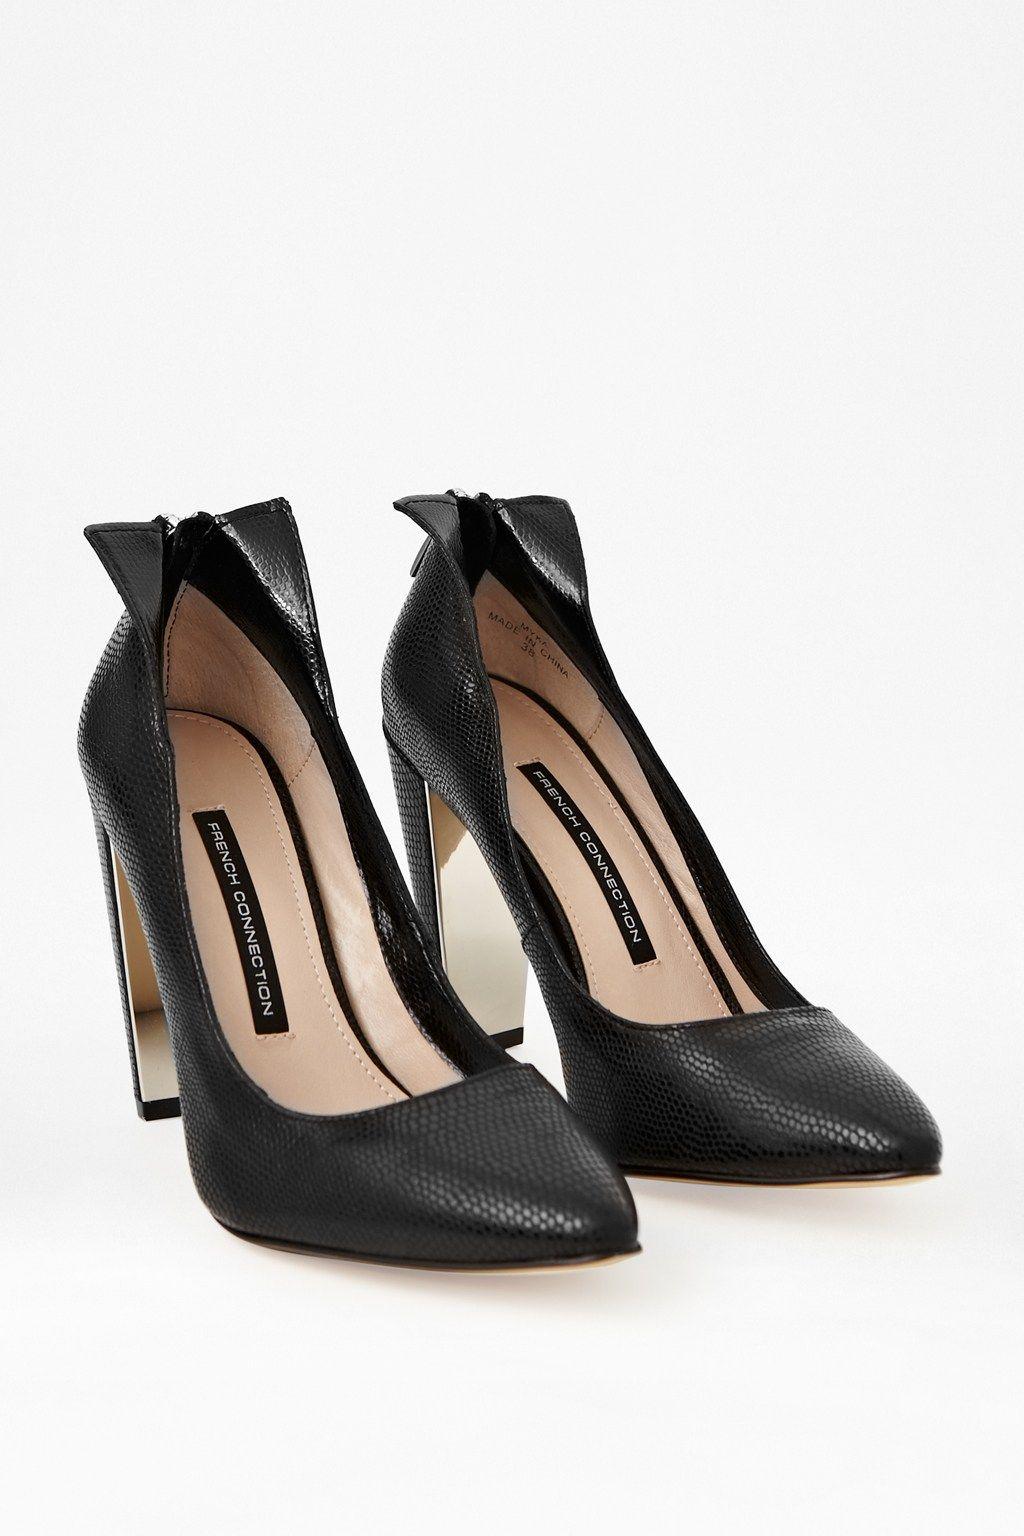 Myka Zipped Leather Court Heels - Sale